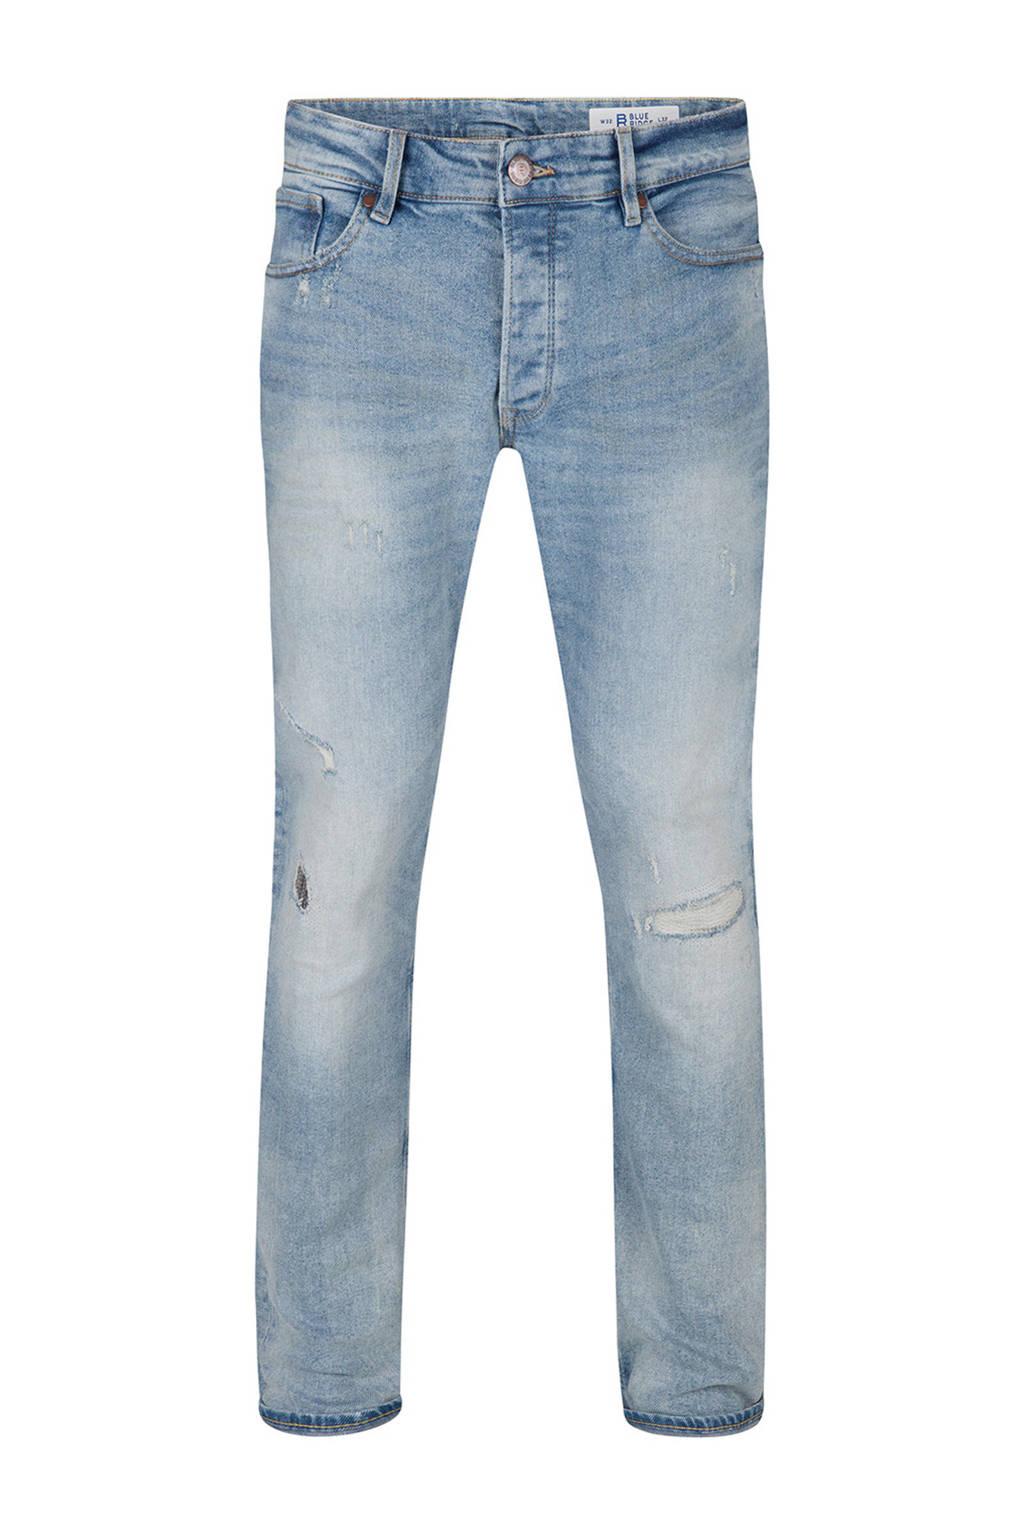 WE Fashion Blue Ridge tapered fit jeans, Light denim